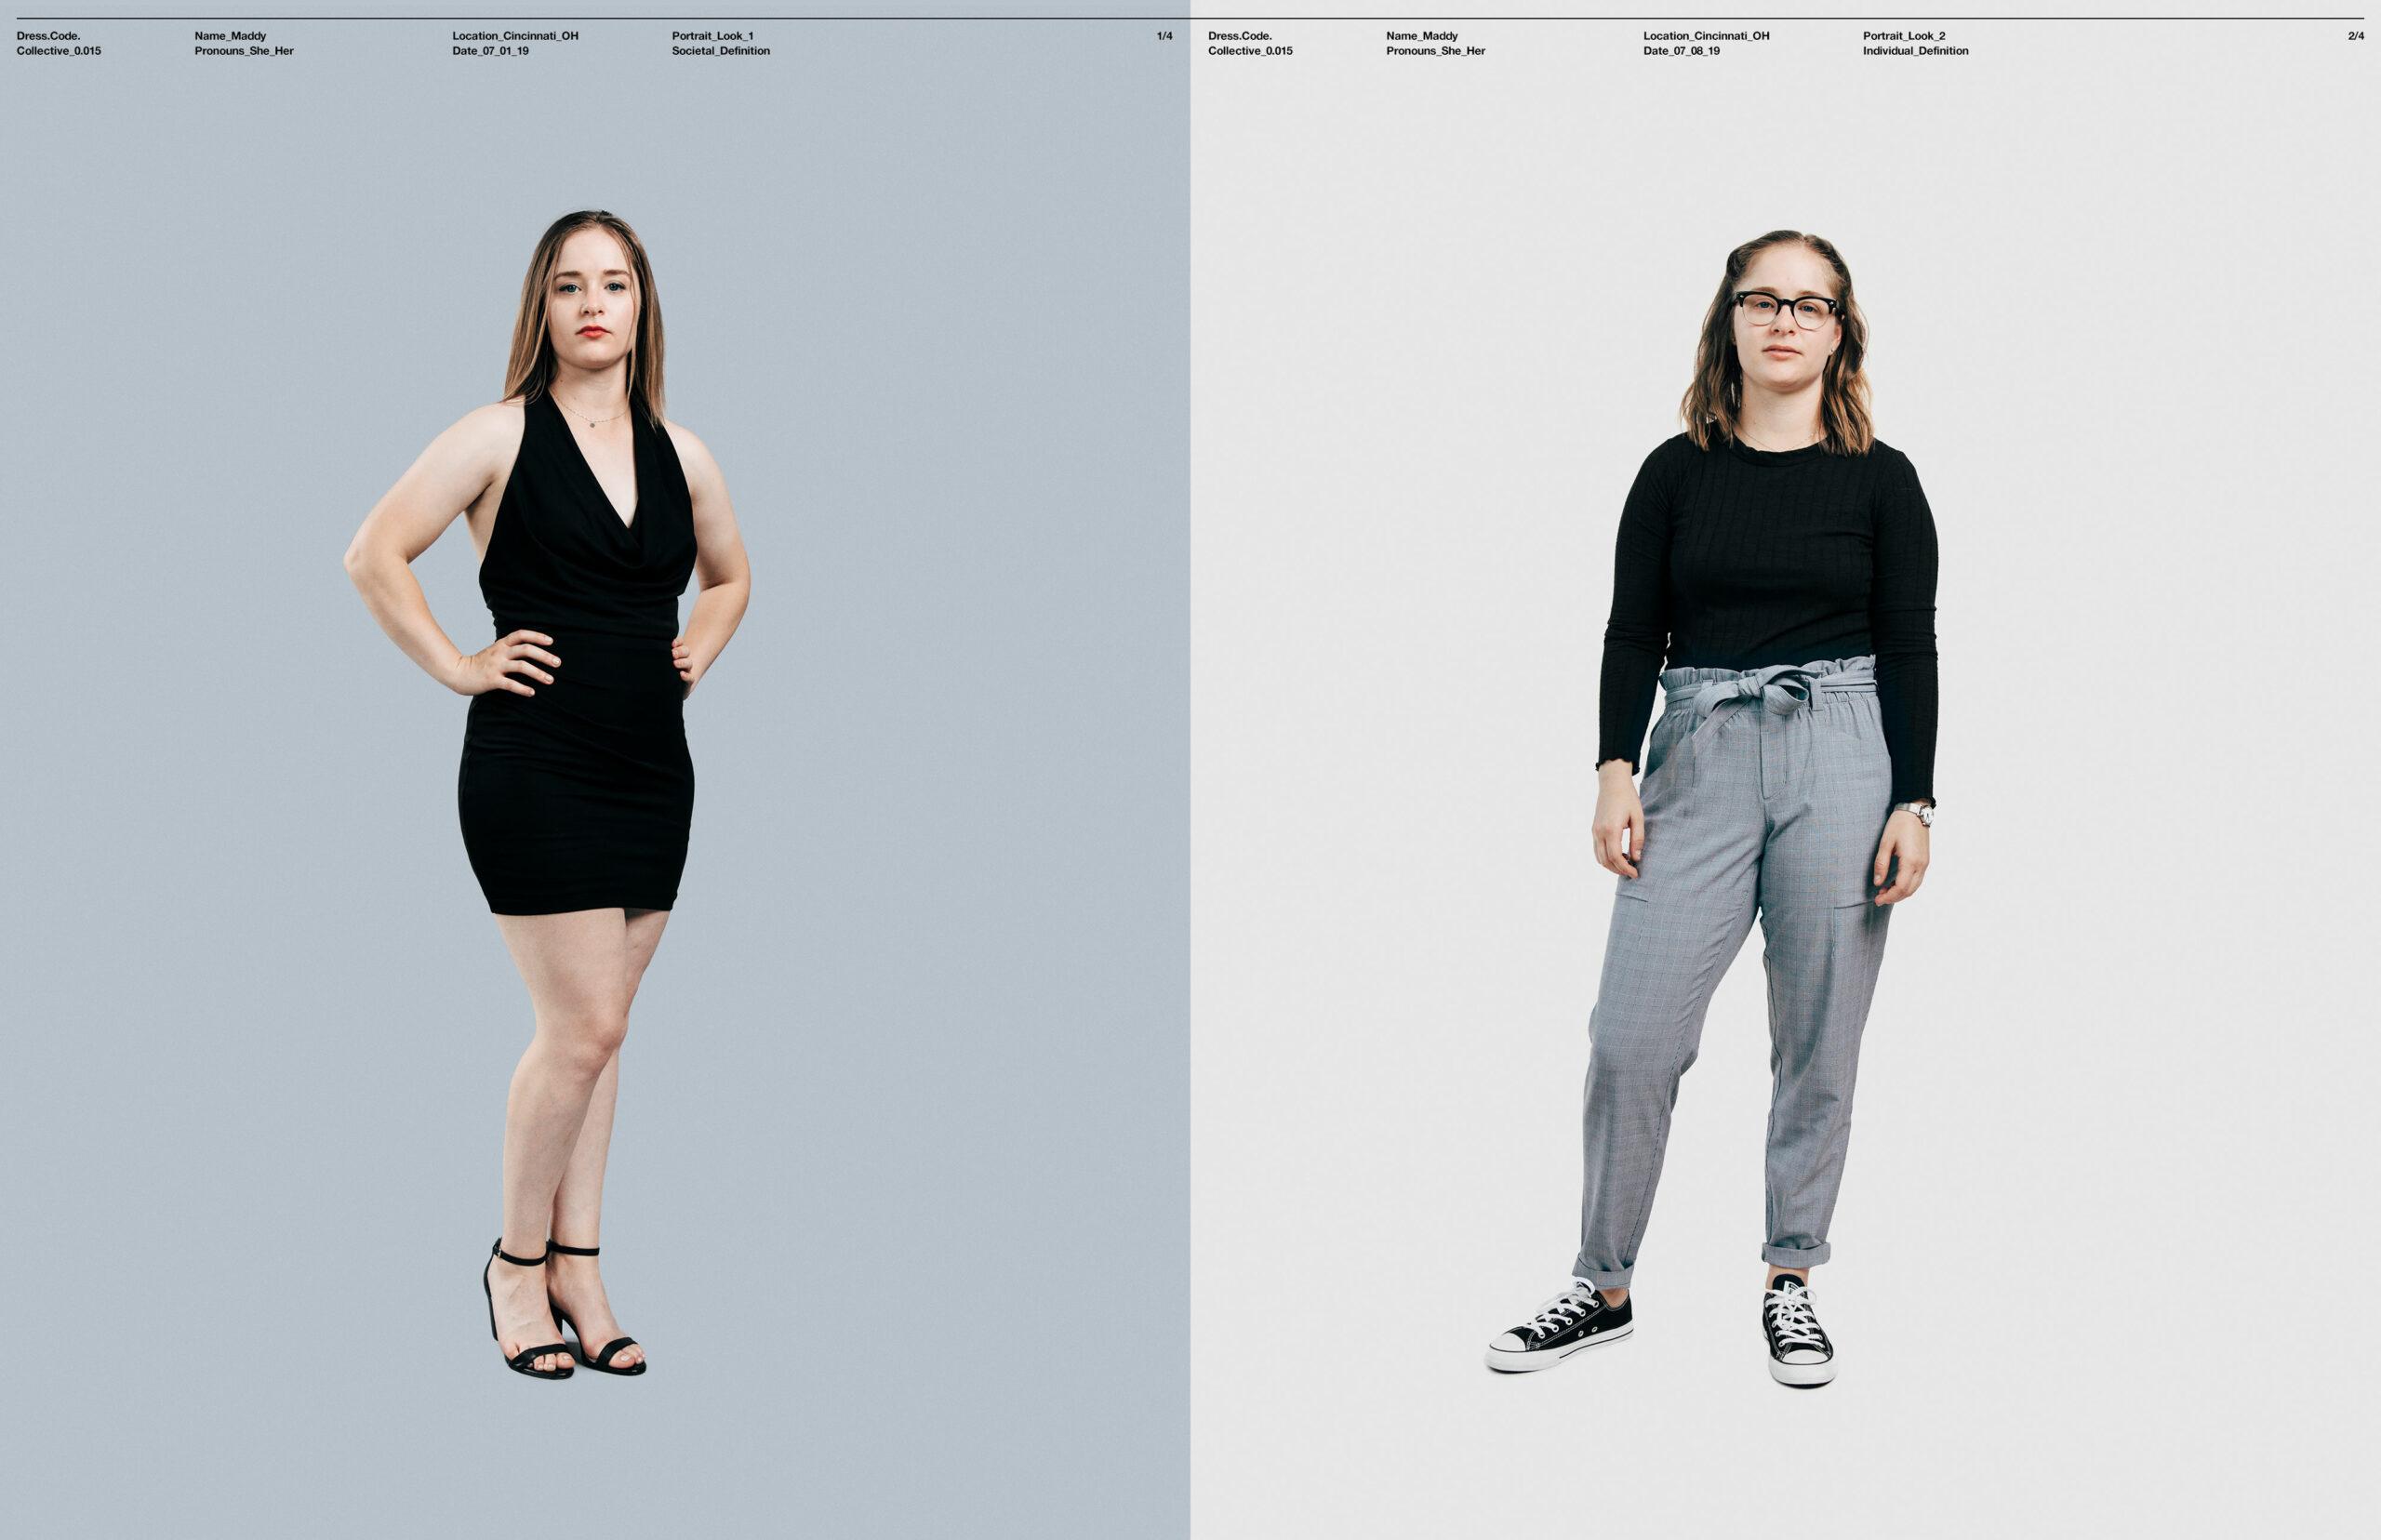 01-Dress-Code23